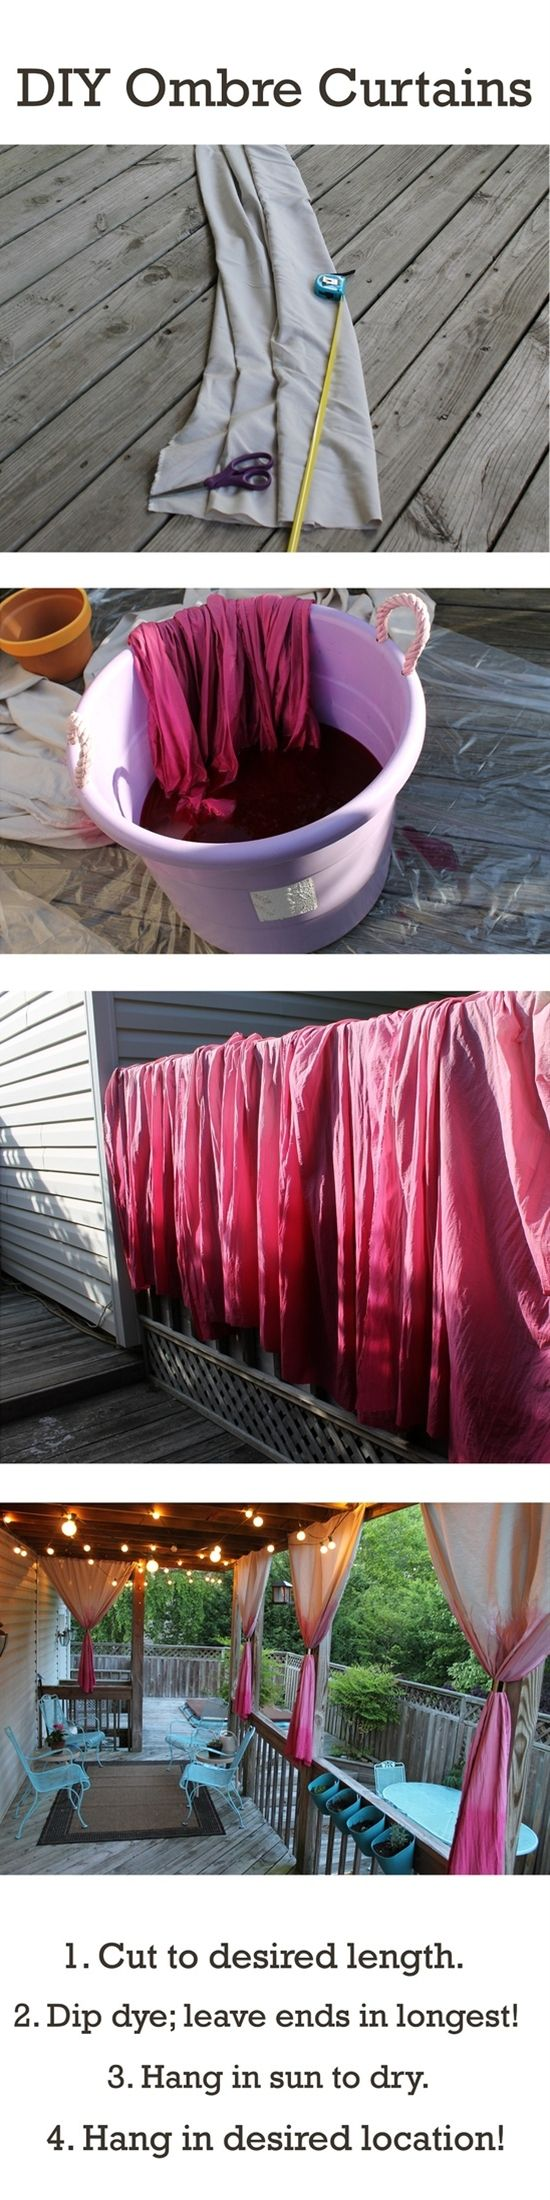 DIY Ombre Curtains Tutorial